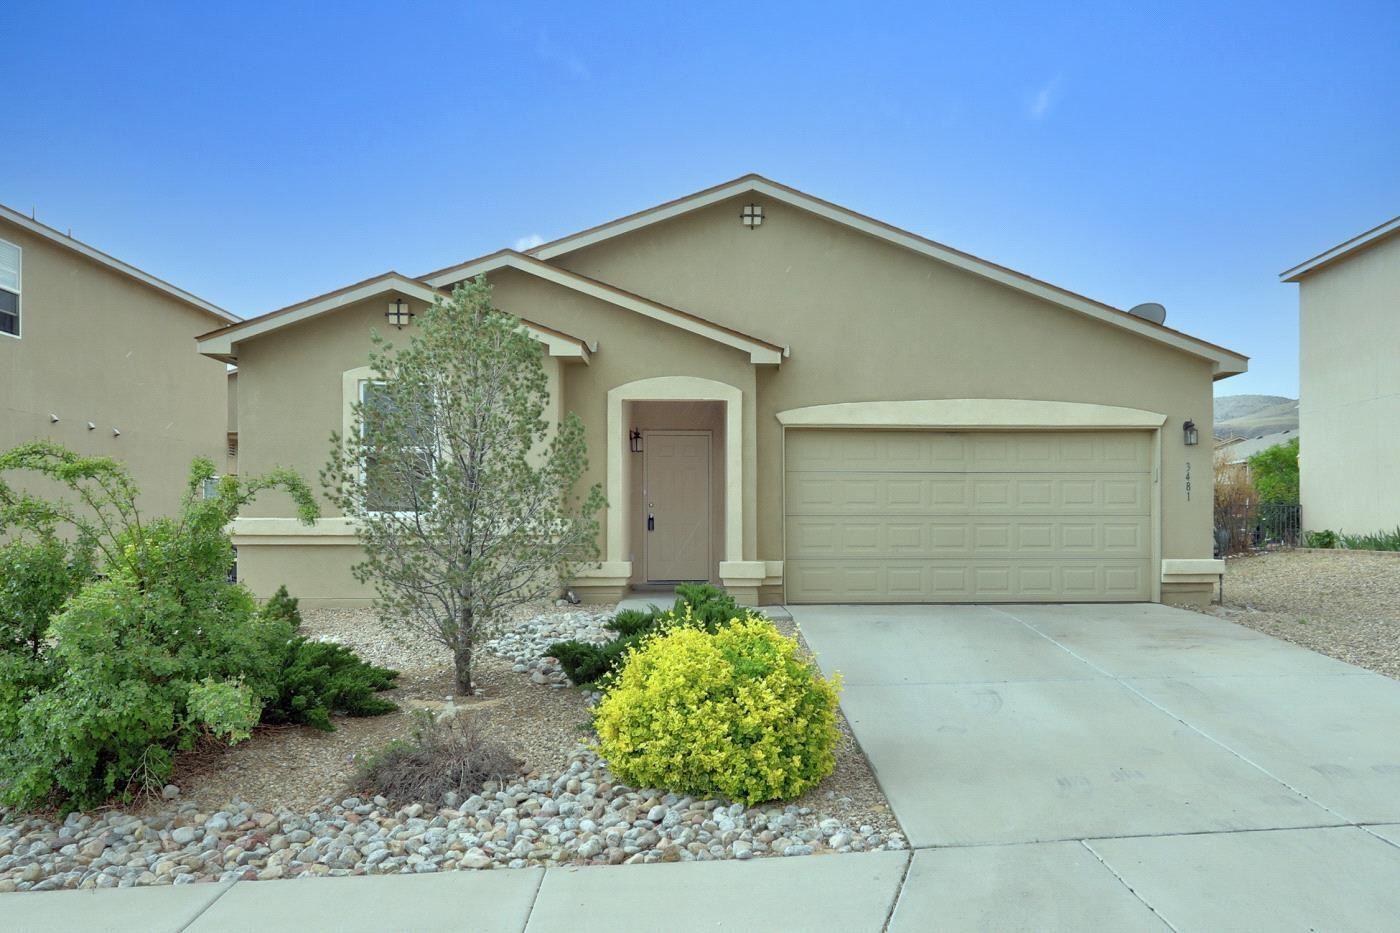 Photo for 3481 STETSON Street SW, Los Lunas, NM 87031 (MLS # 991975)